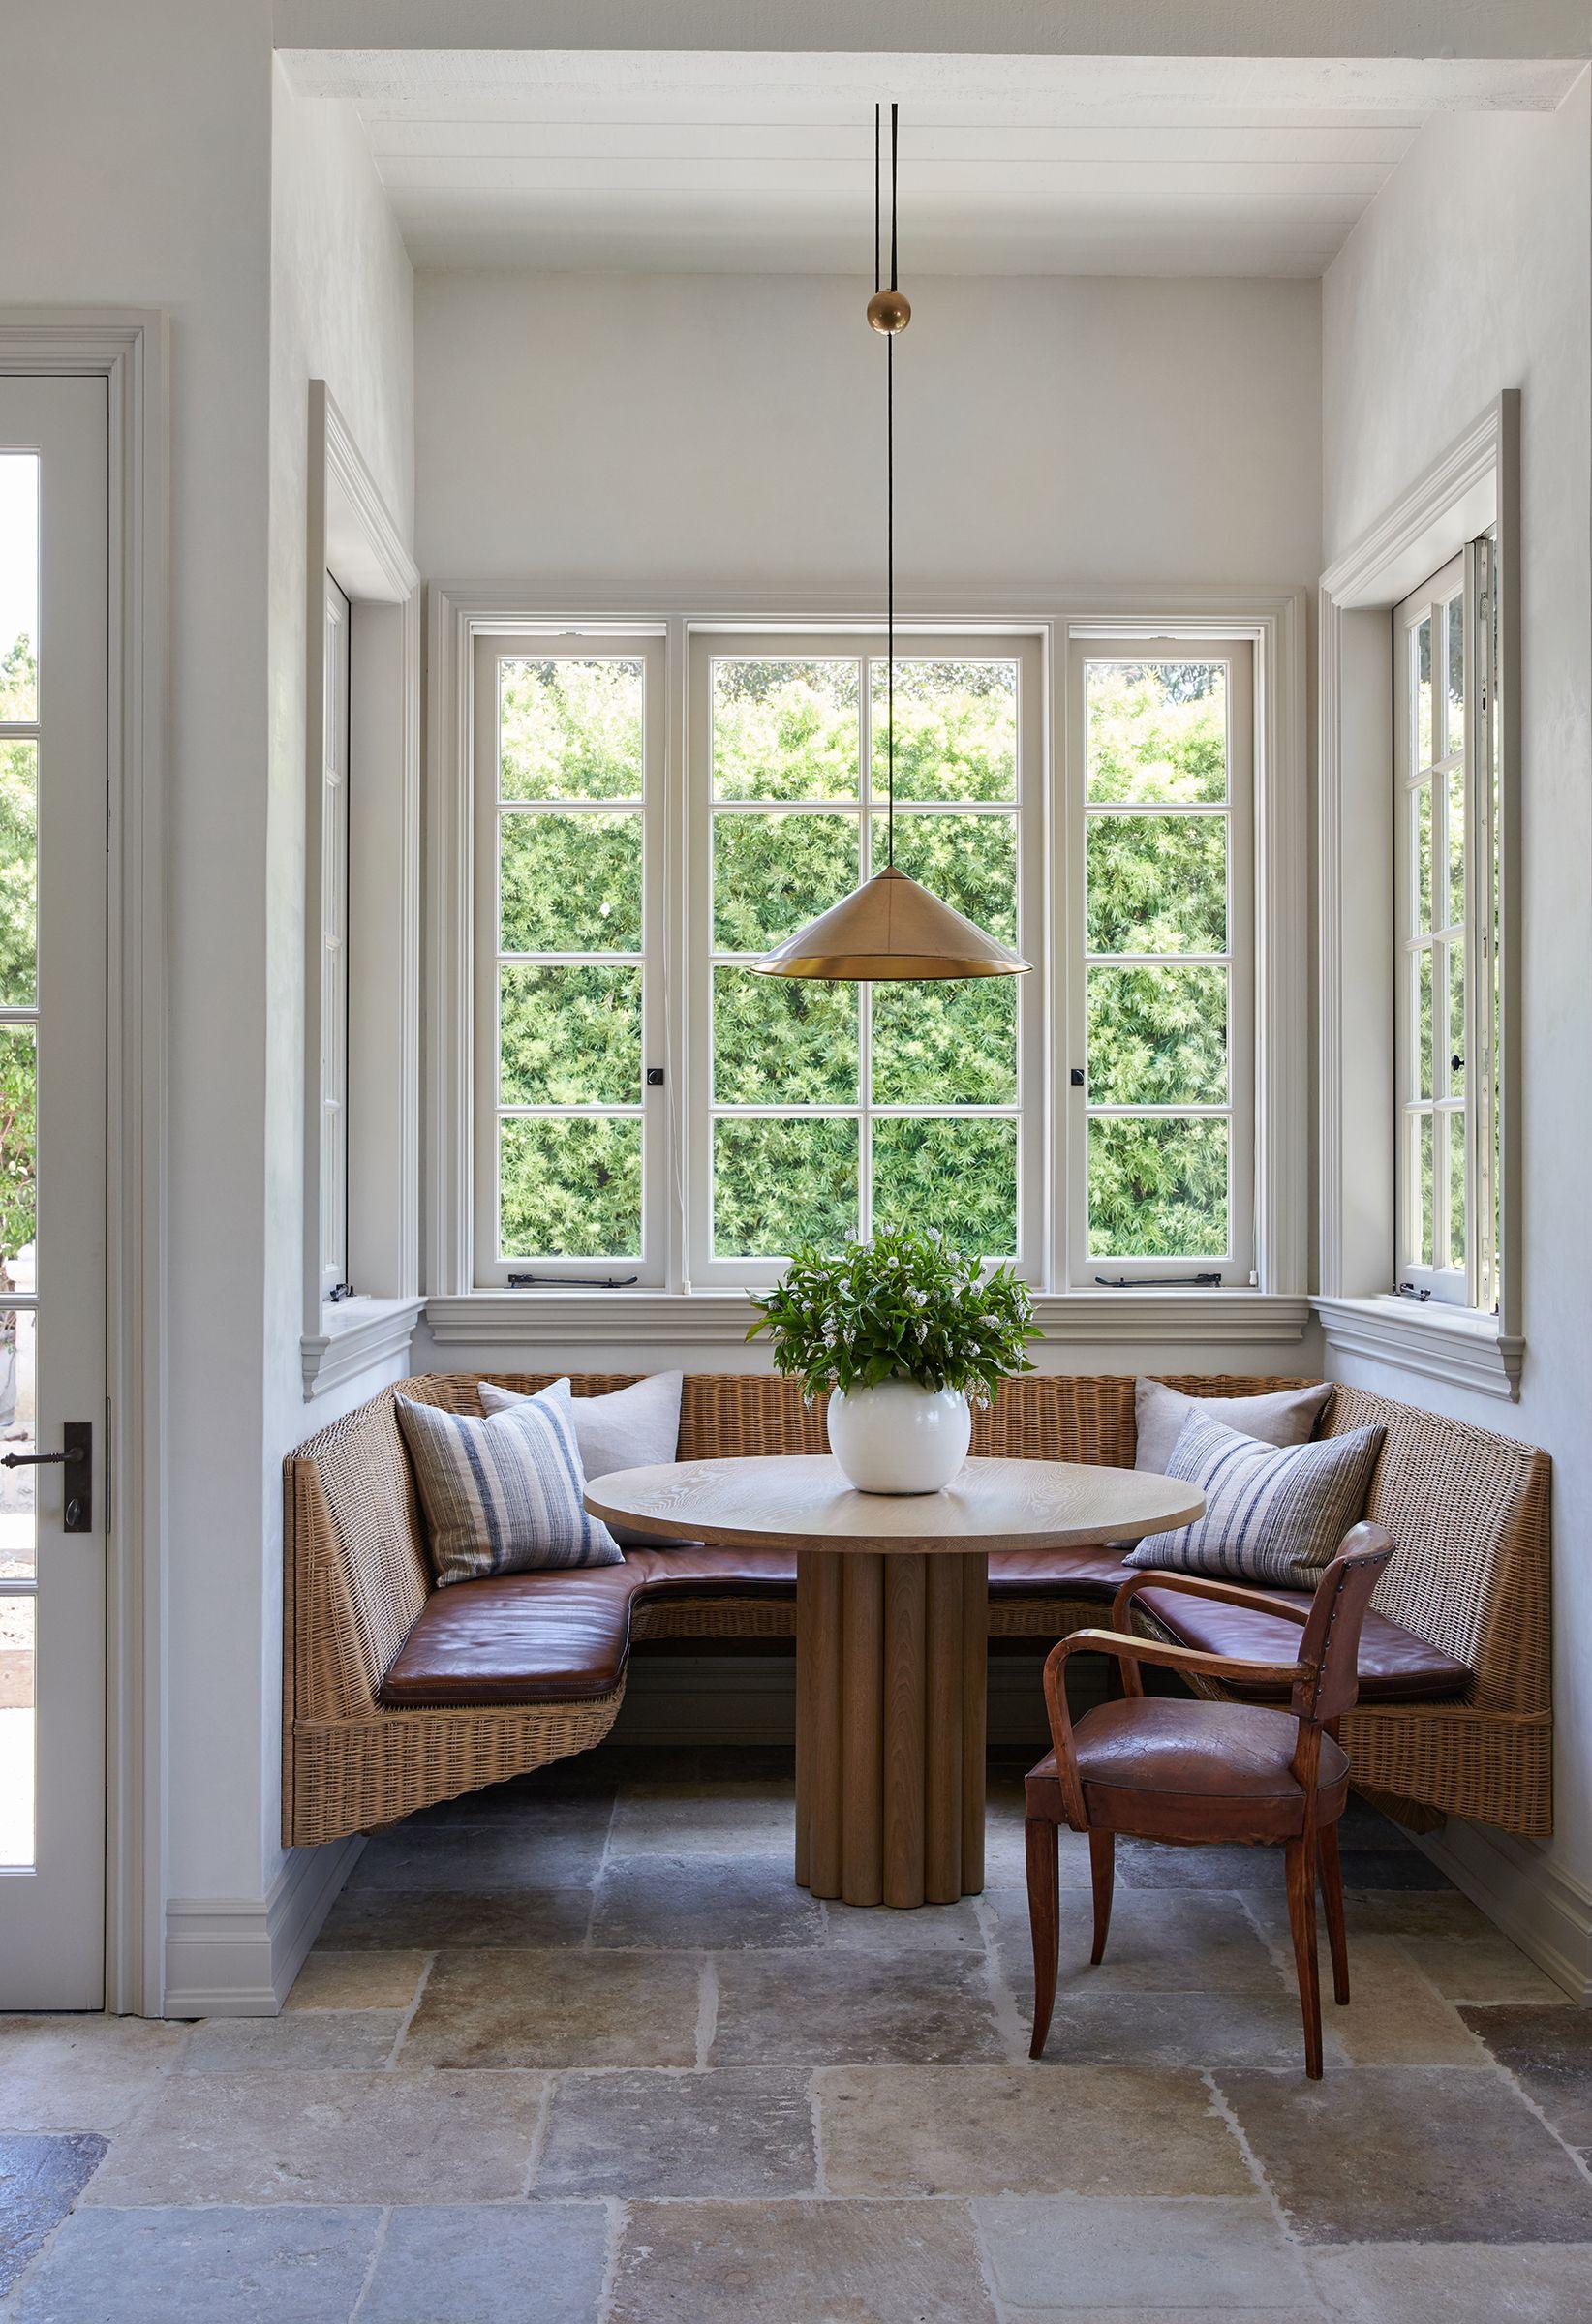 Amber-Interiors-Client-Bu-Round-Two-Tessa-Neustadt-24-2a.jpg